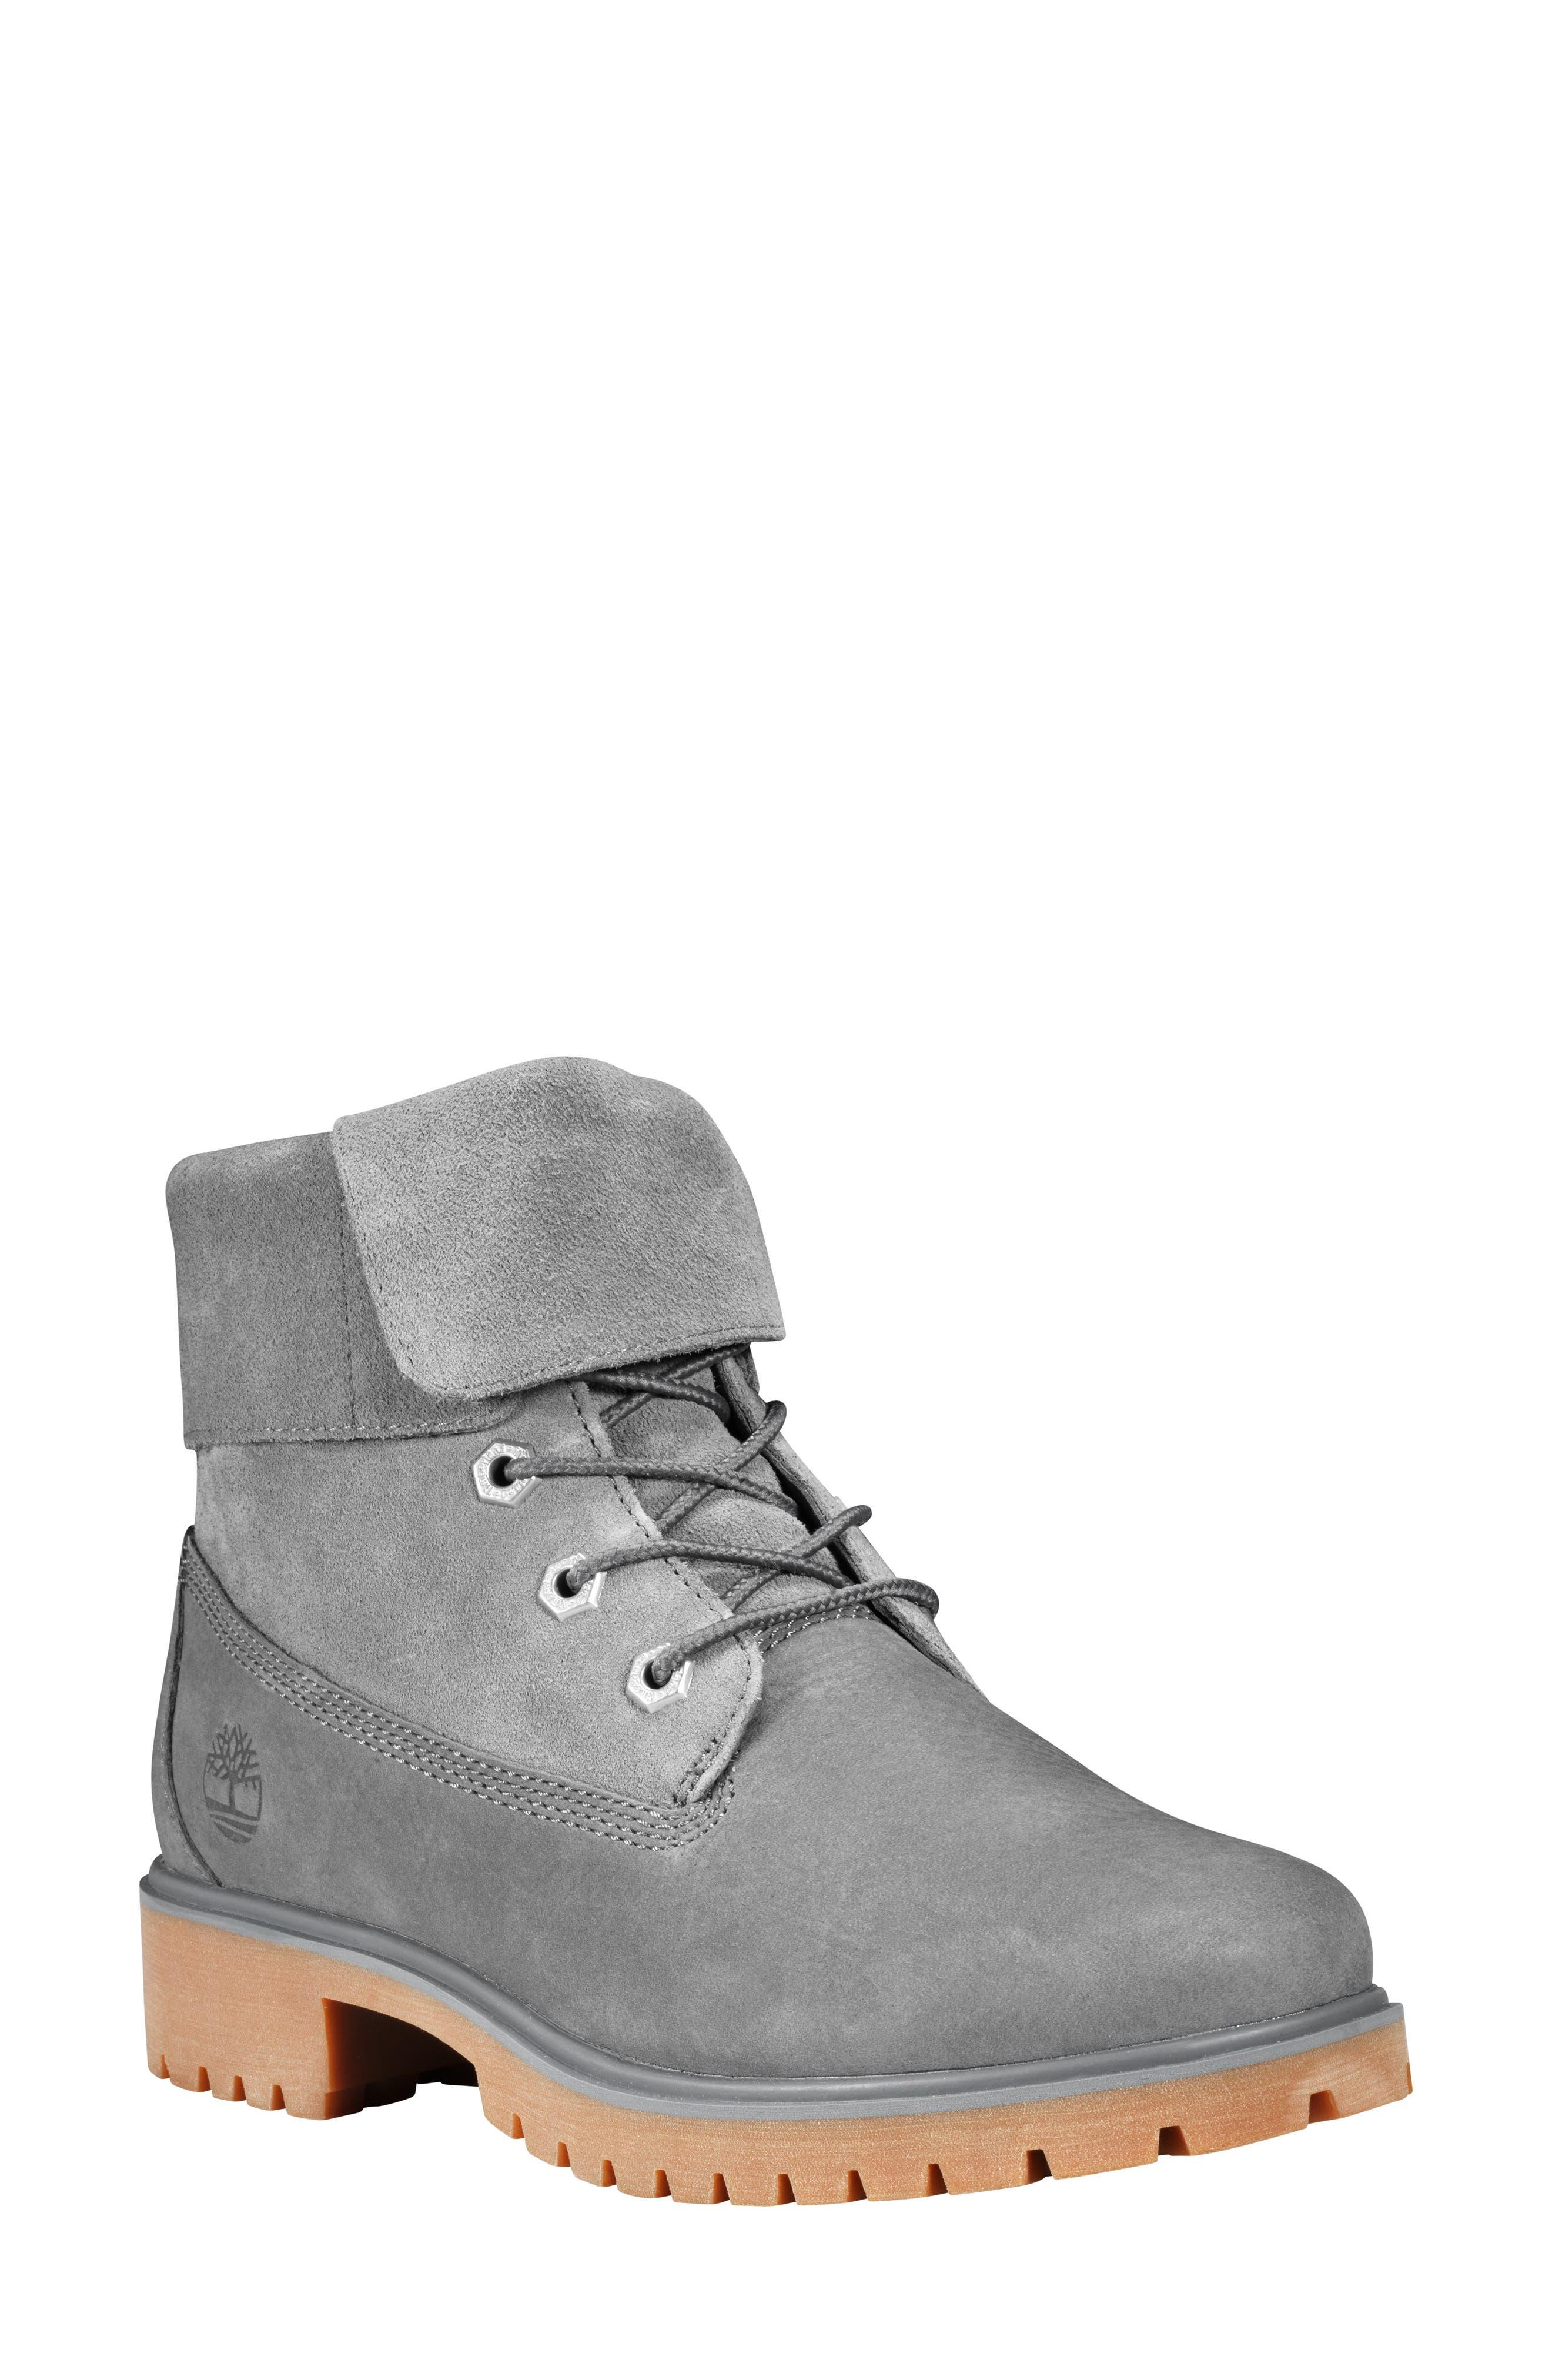 Timberland Jayne Waterproof Bootie- Grey